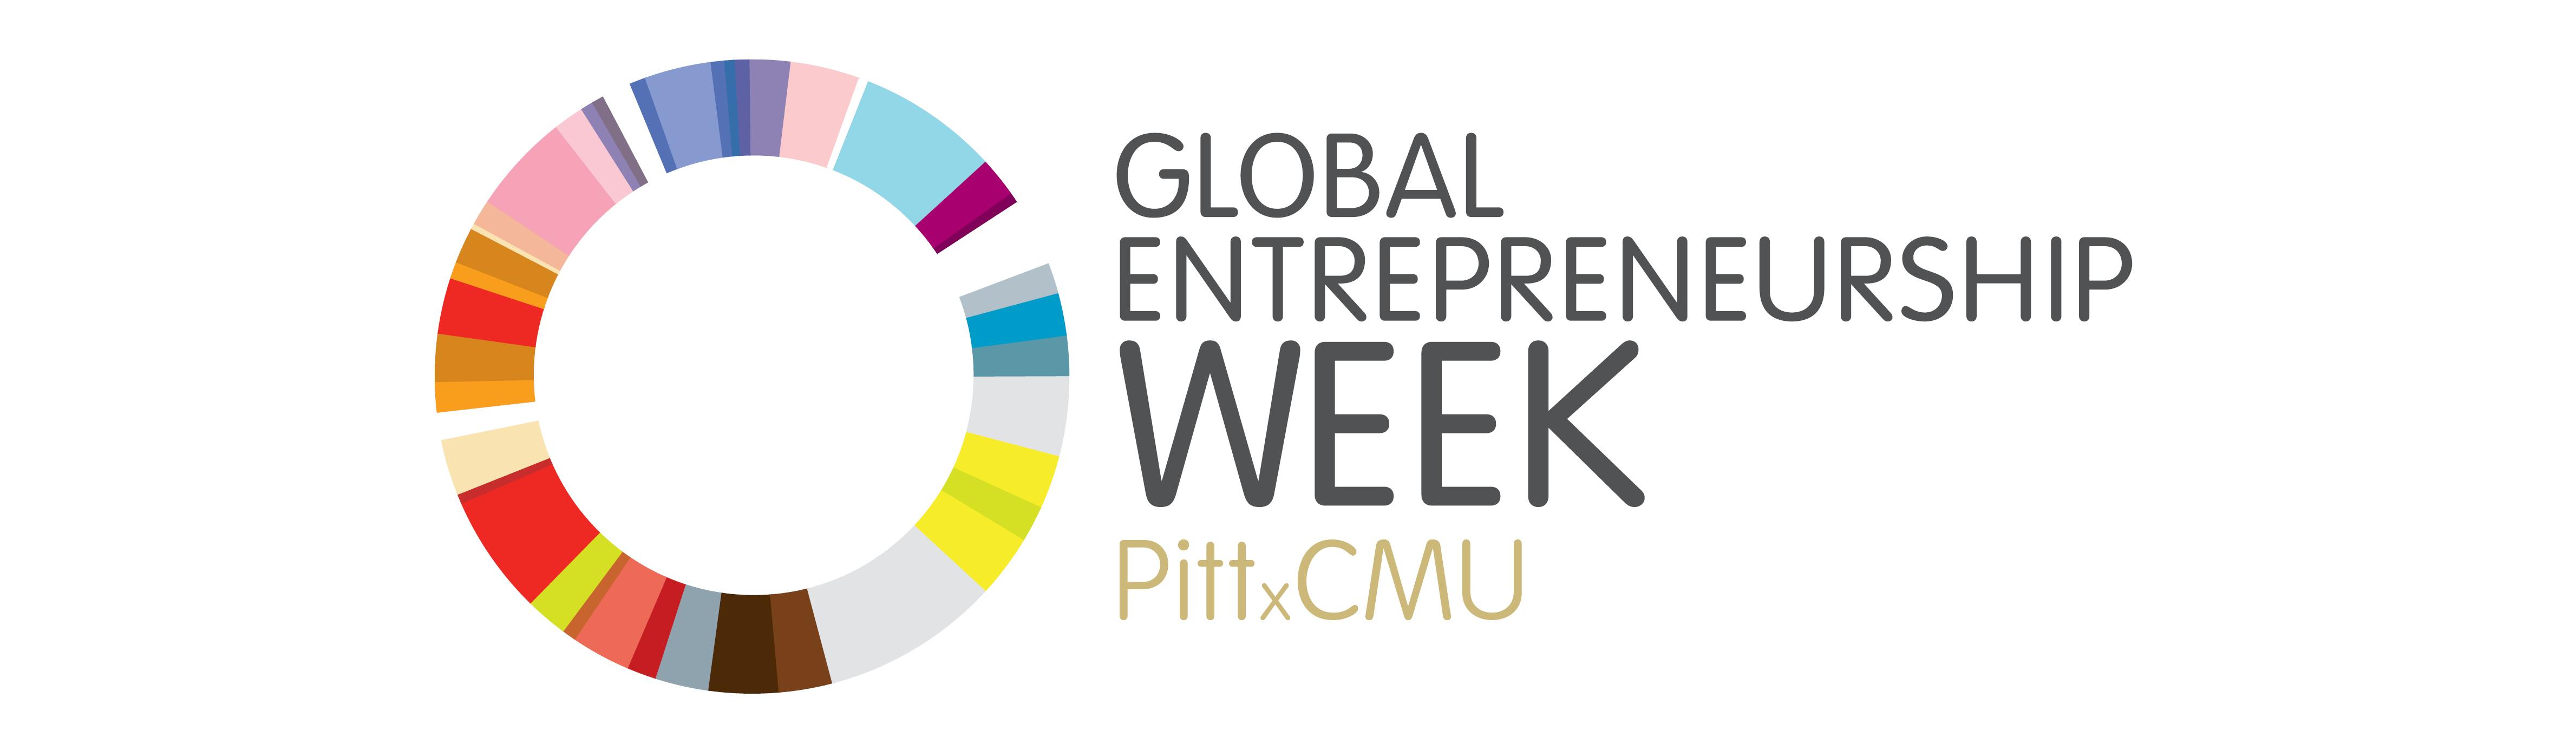 GE-Week-Web-Banner-Fall-2018